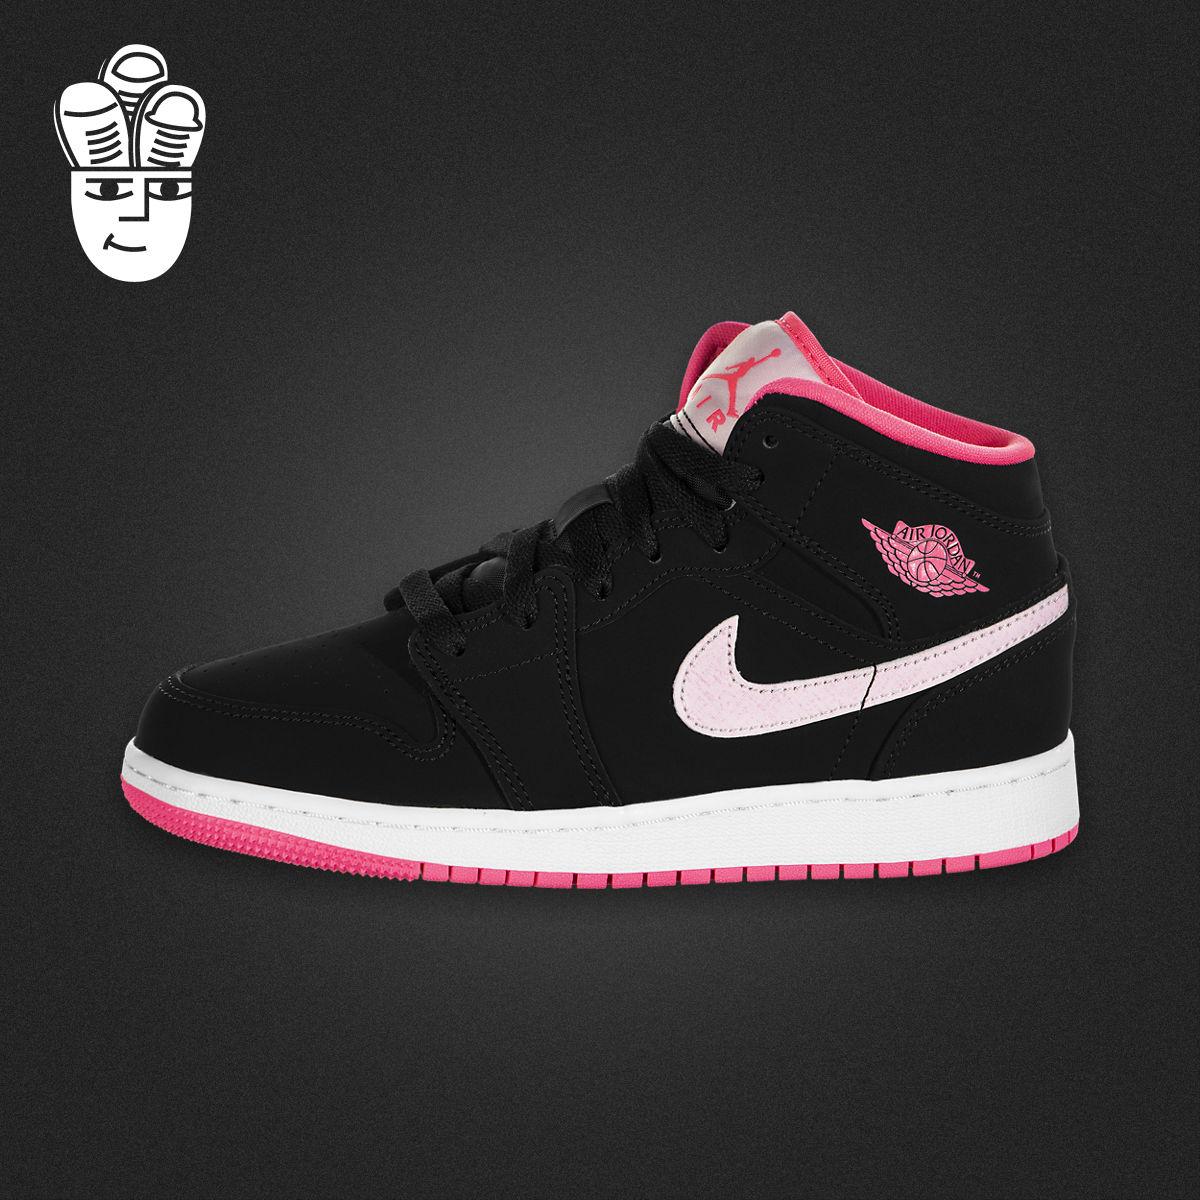 Air Jordan 1 Mid AJ1男鞋女鞋GS运动鞋 中帮经典篮球鞋